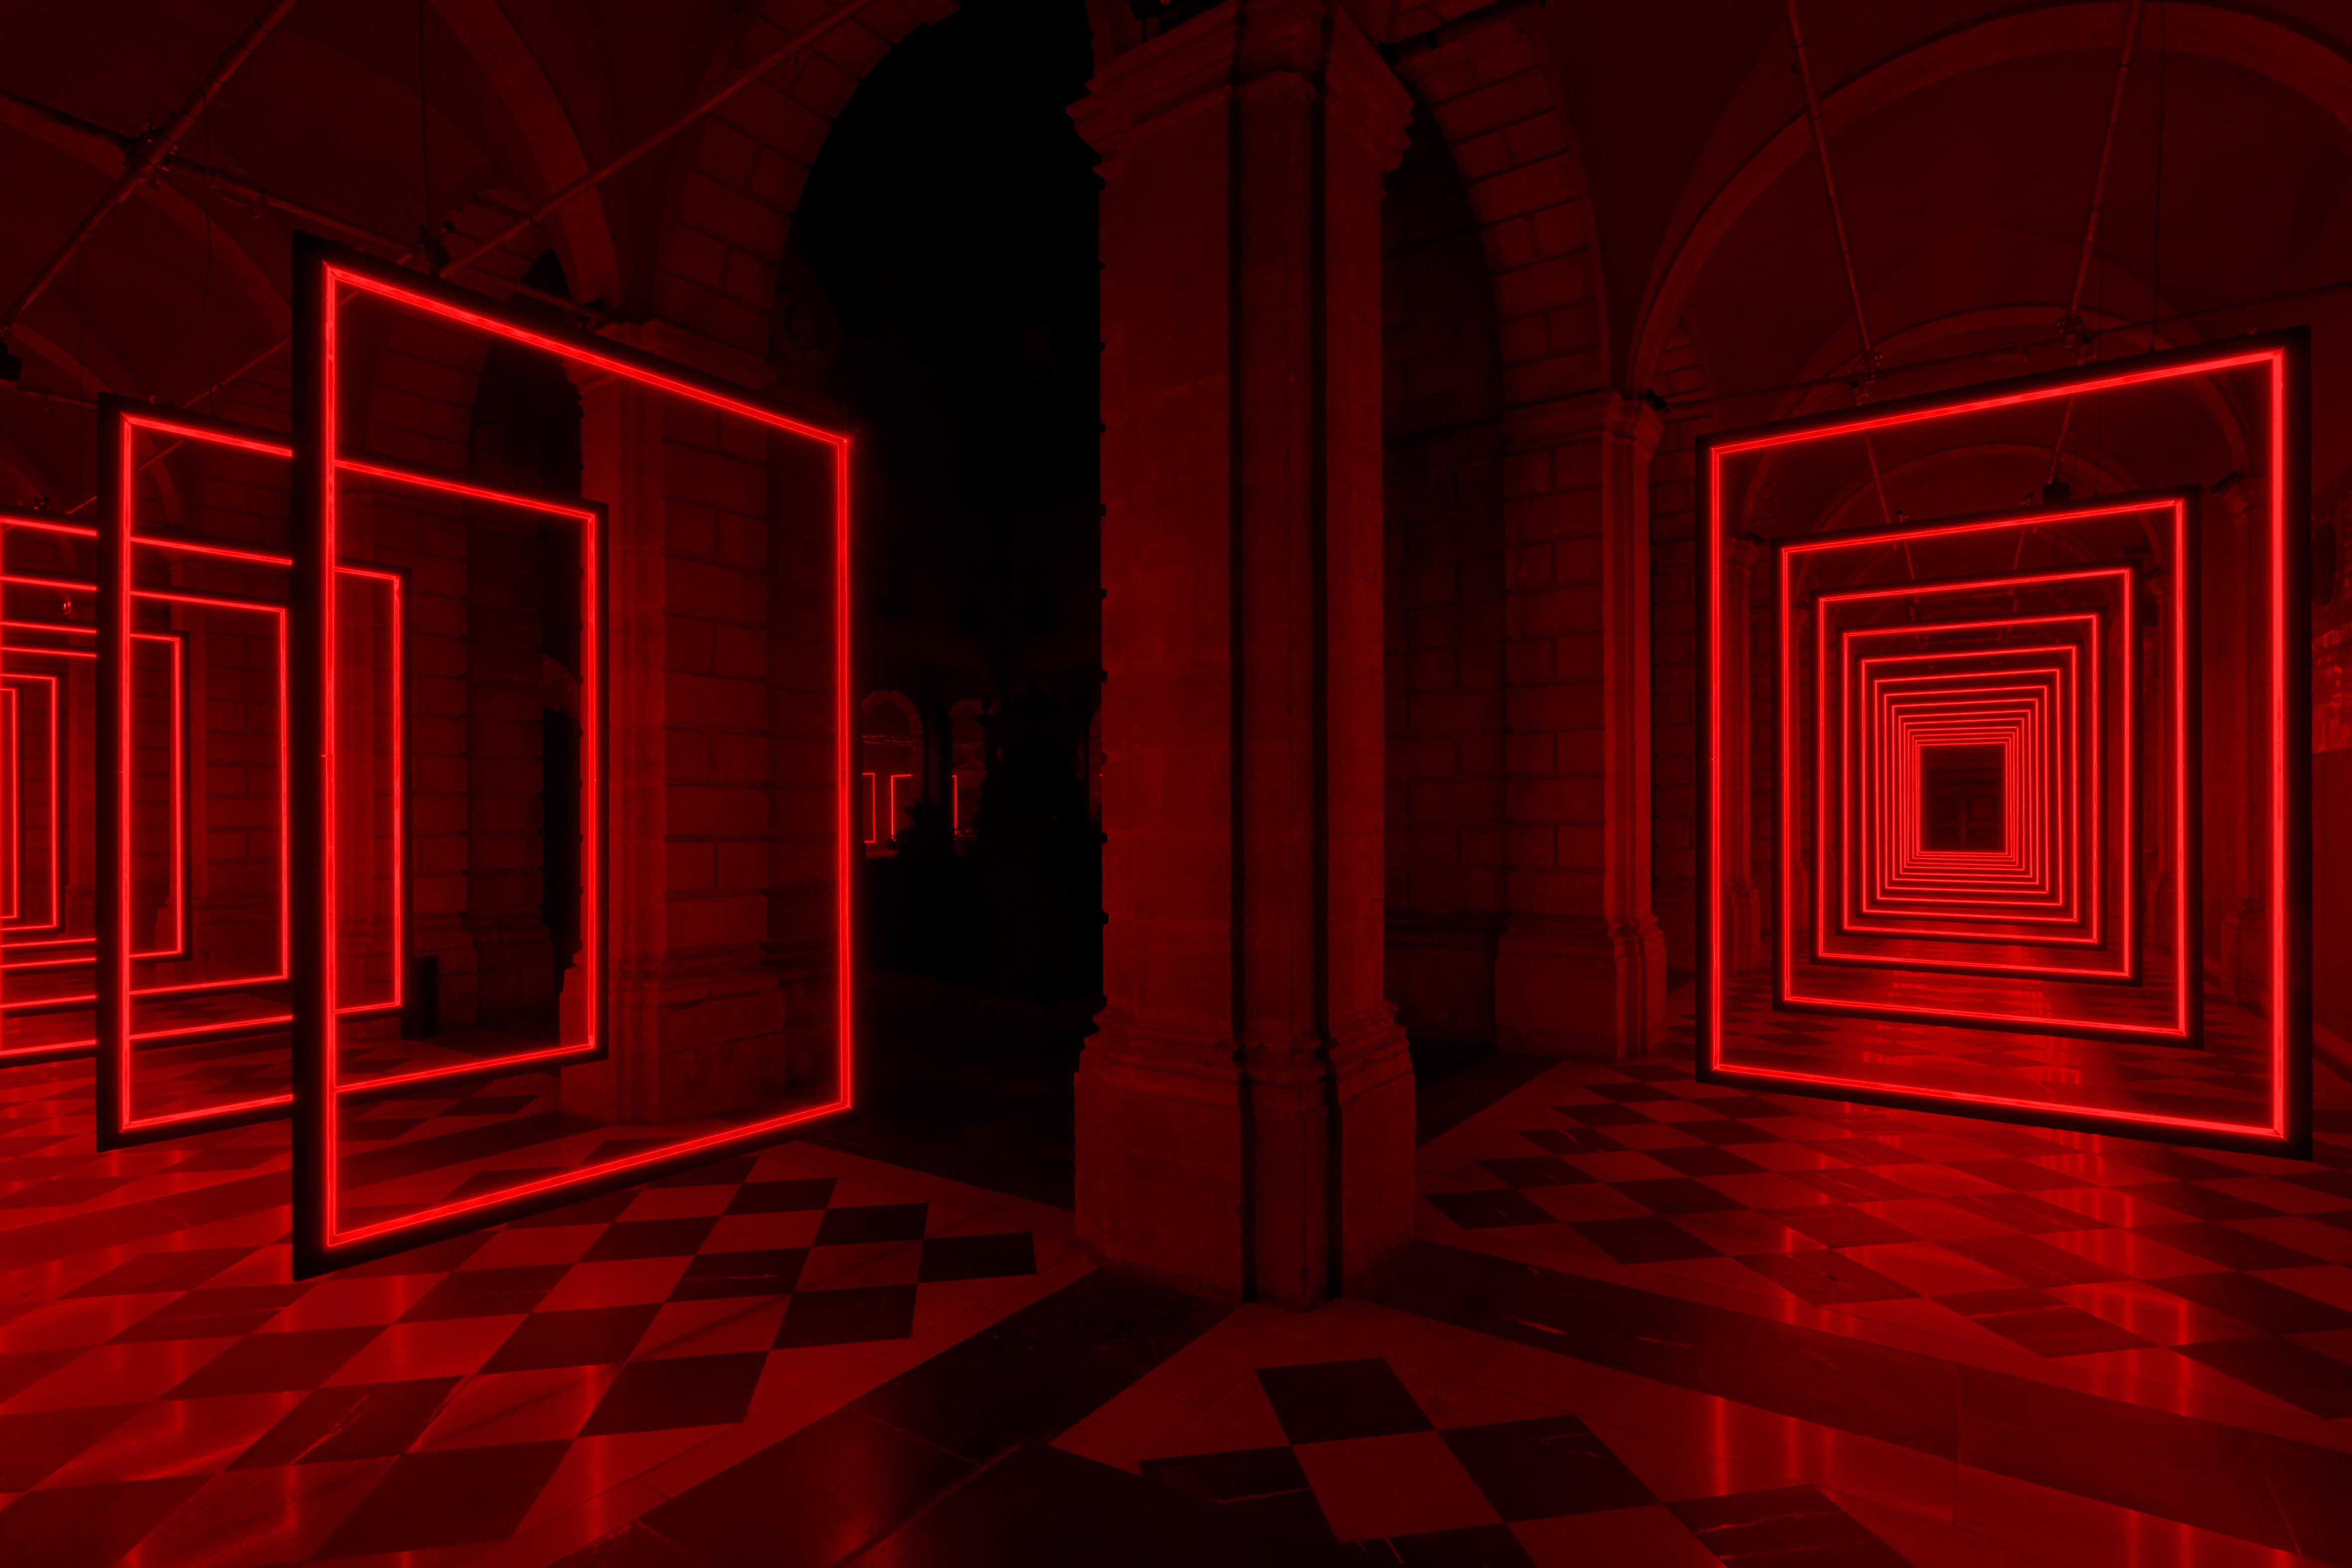 Olivier Ratsi, Frame Perspective LED, Holz, Software, 8 Audio-Kanäle 30 x 2,4 x 30m, Hersteller: Crossed Lab © Olivier Ratsi